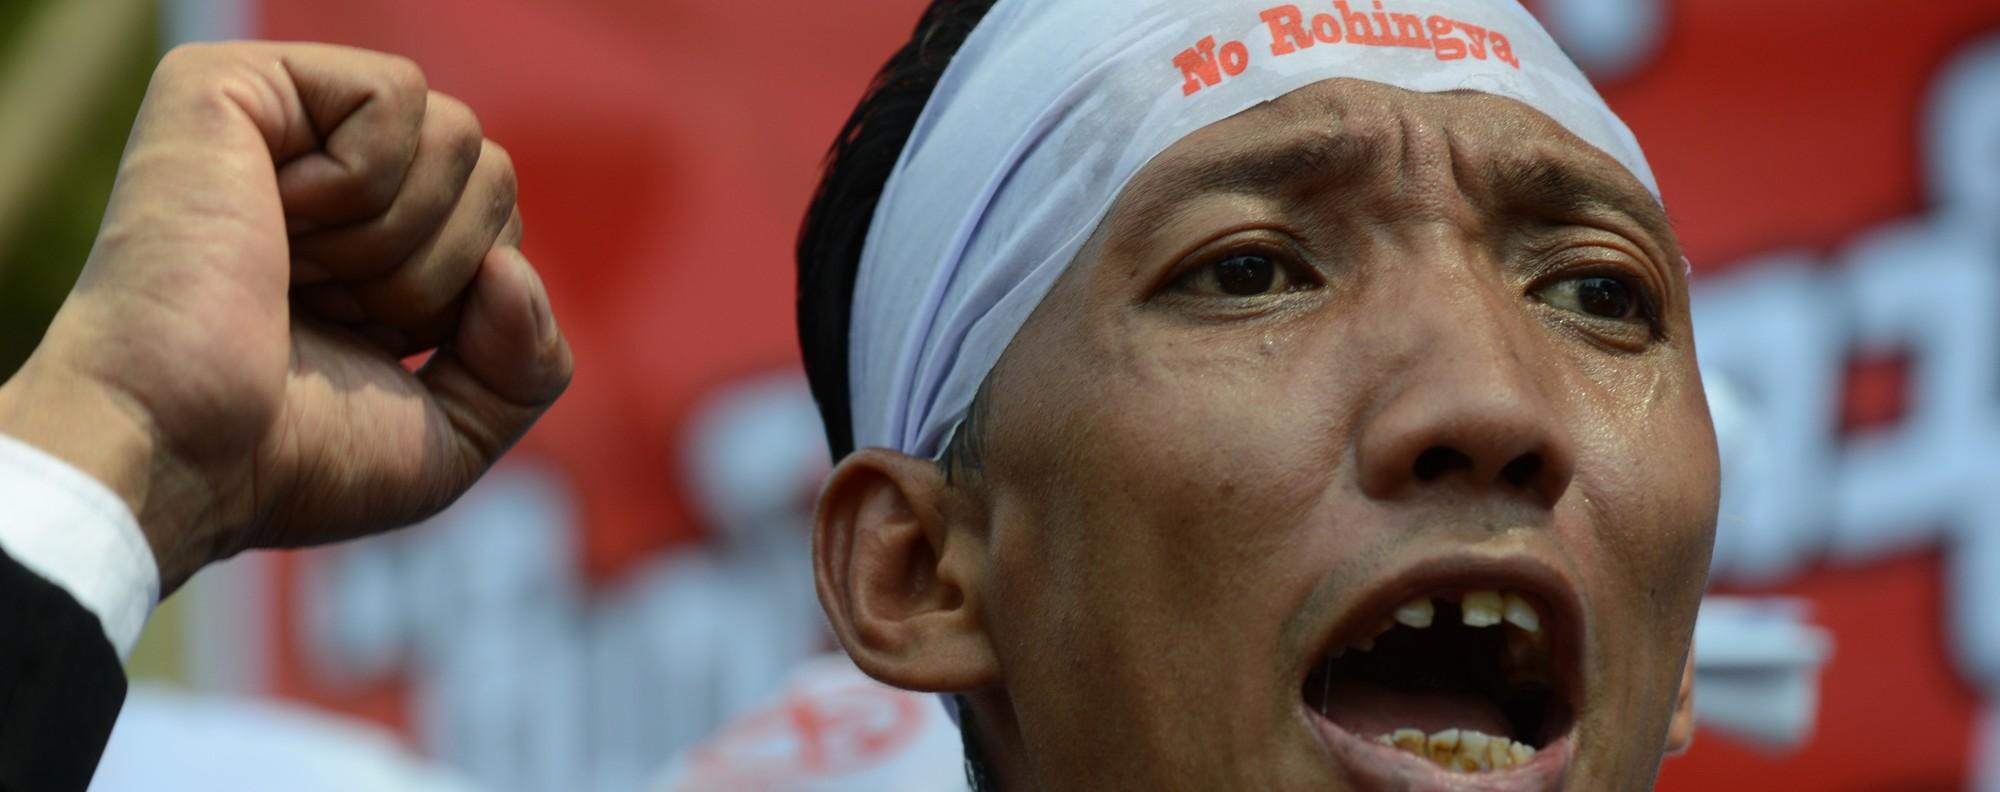 A MaBaTha rally in Yangon. Photo: AFP